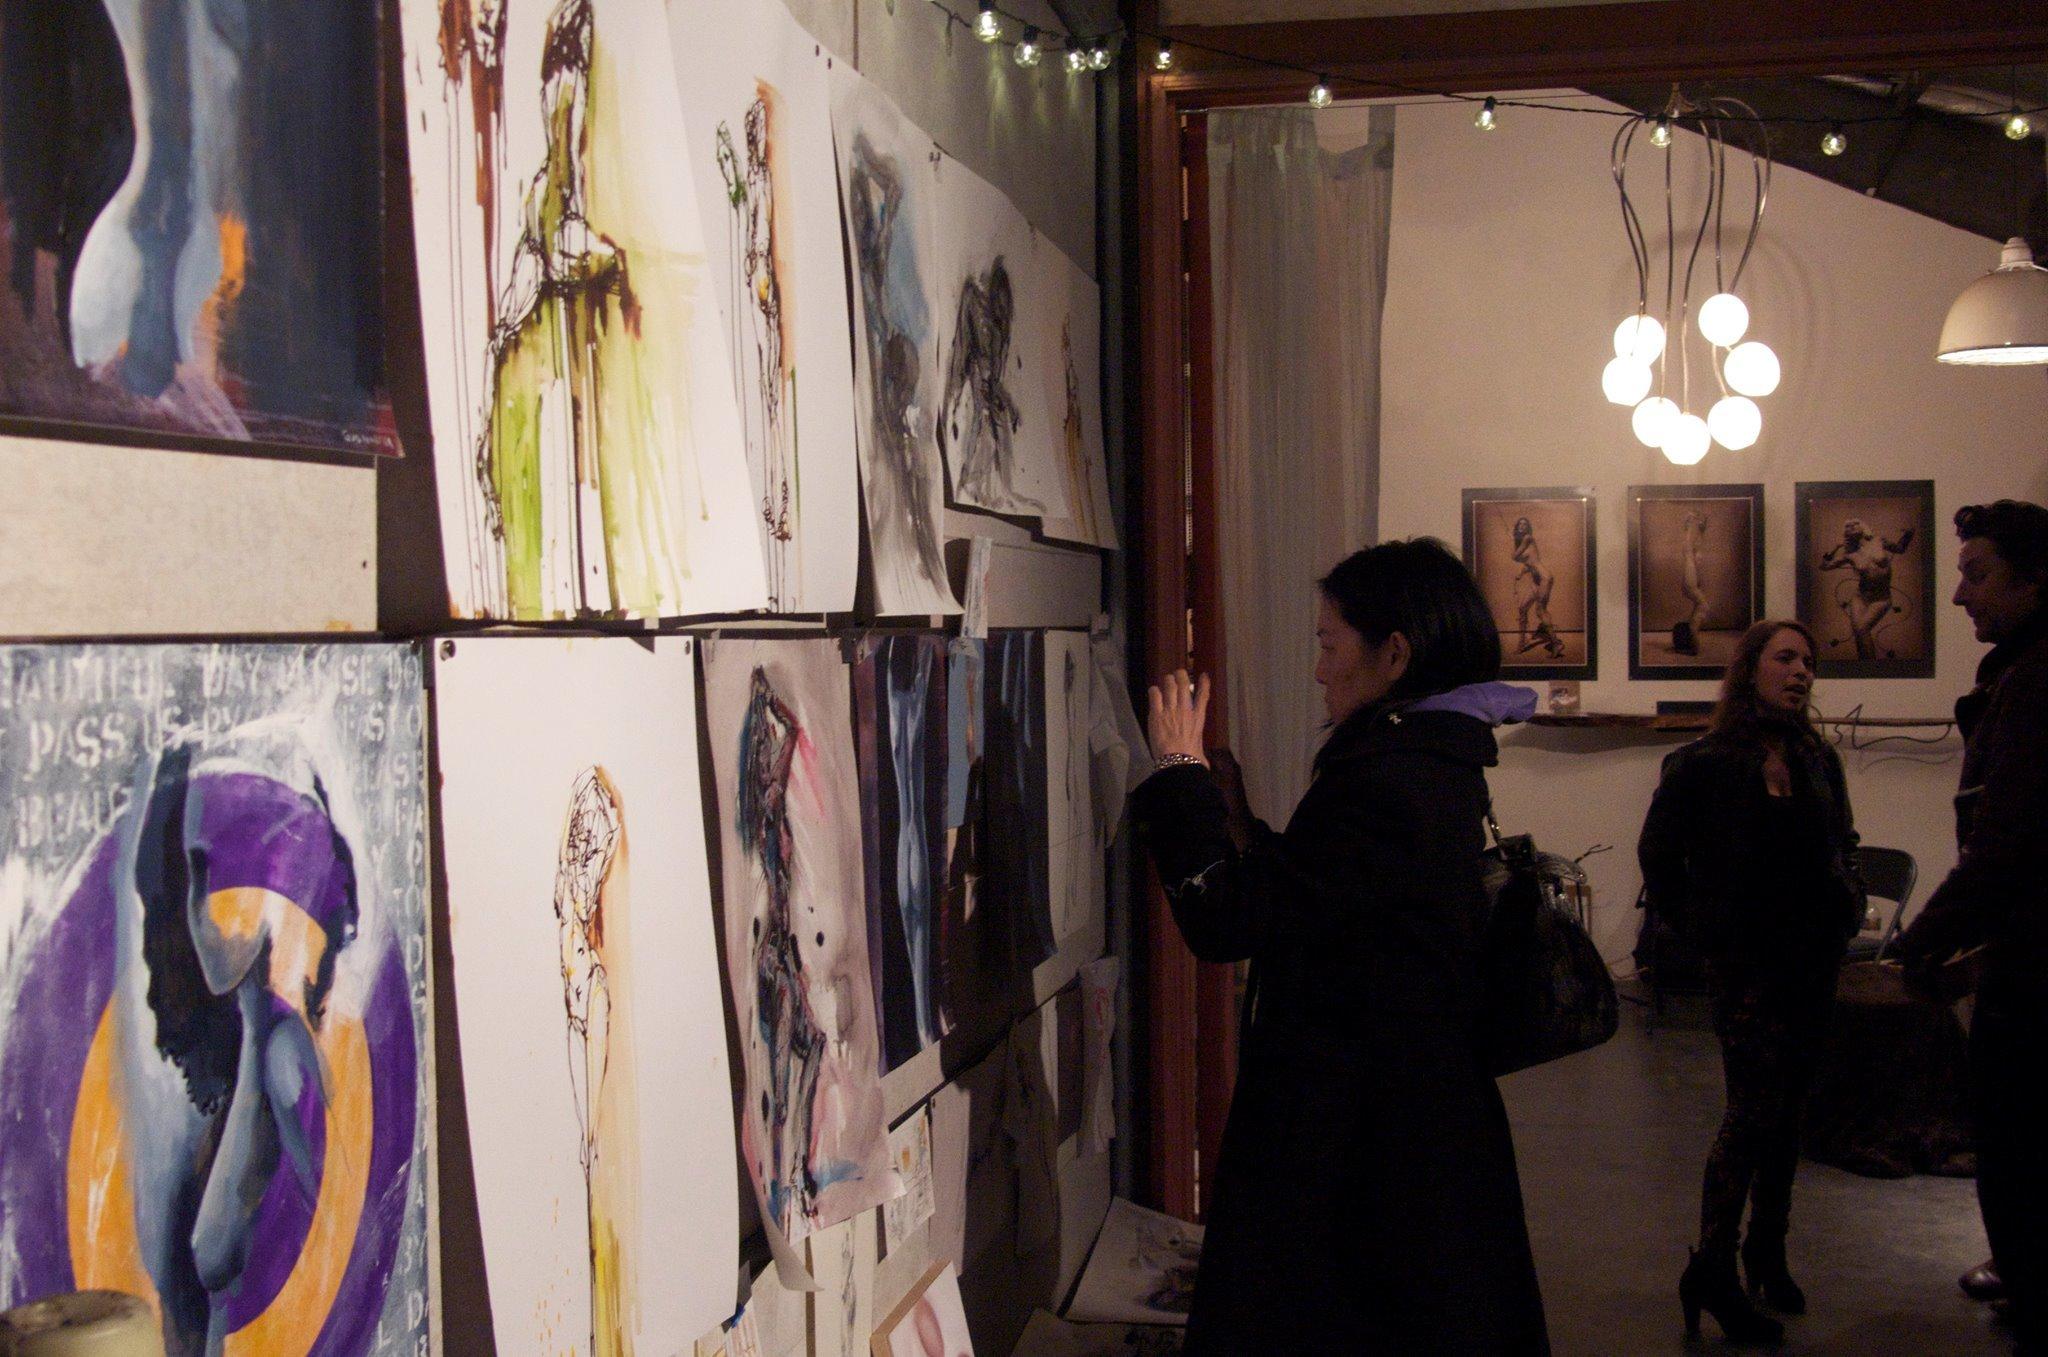 1003 Art Gallery & Lounge